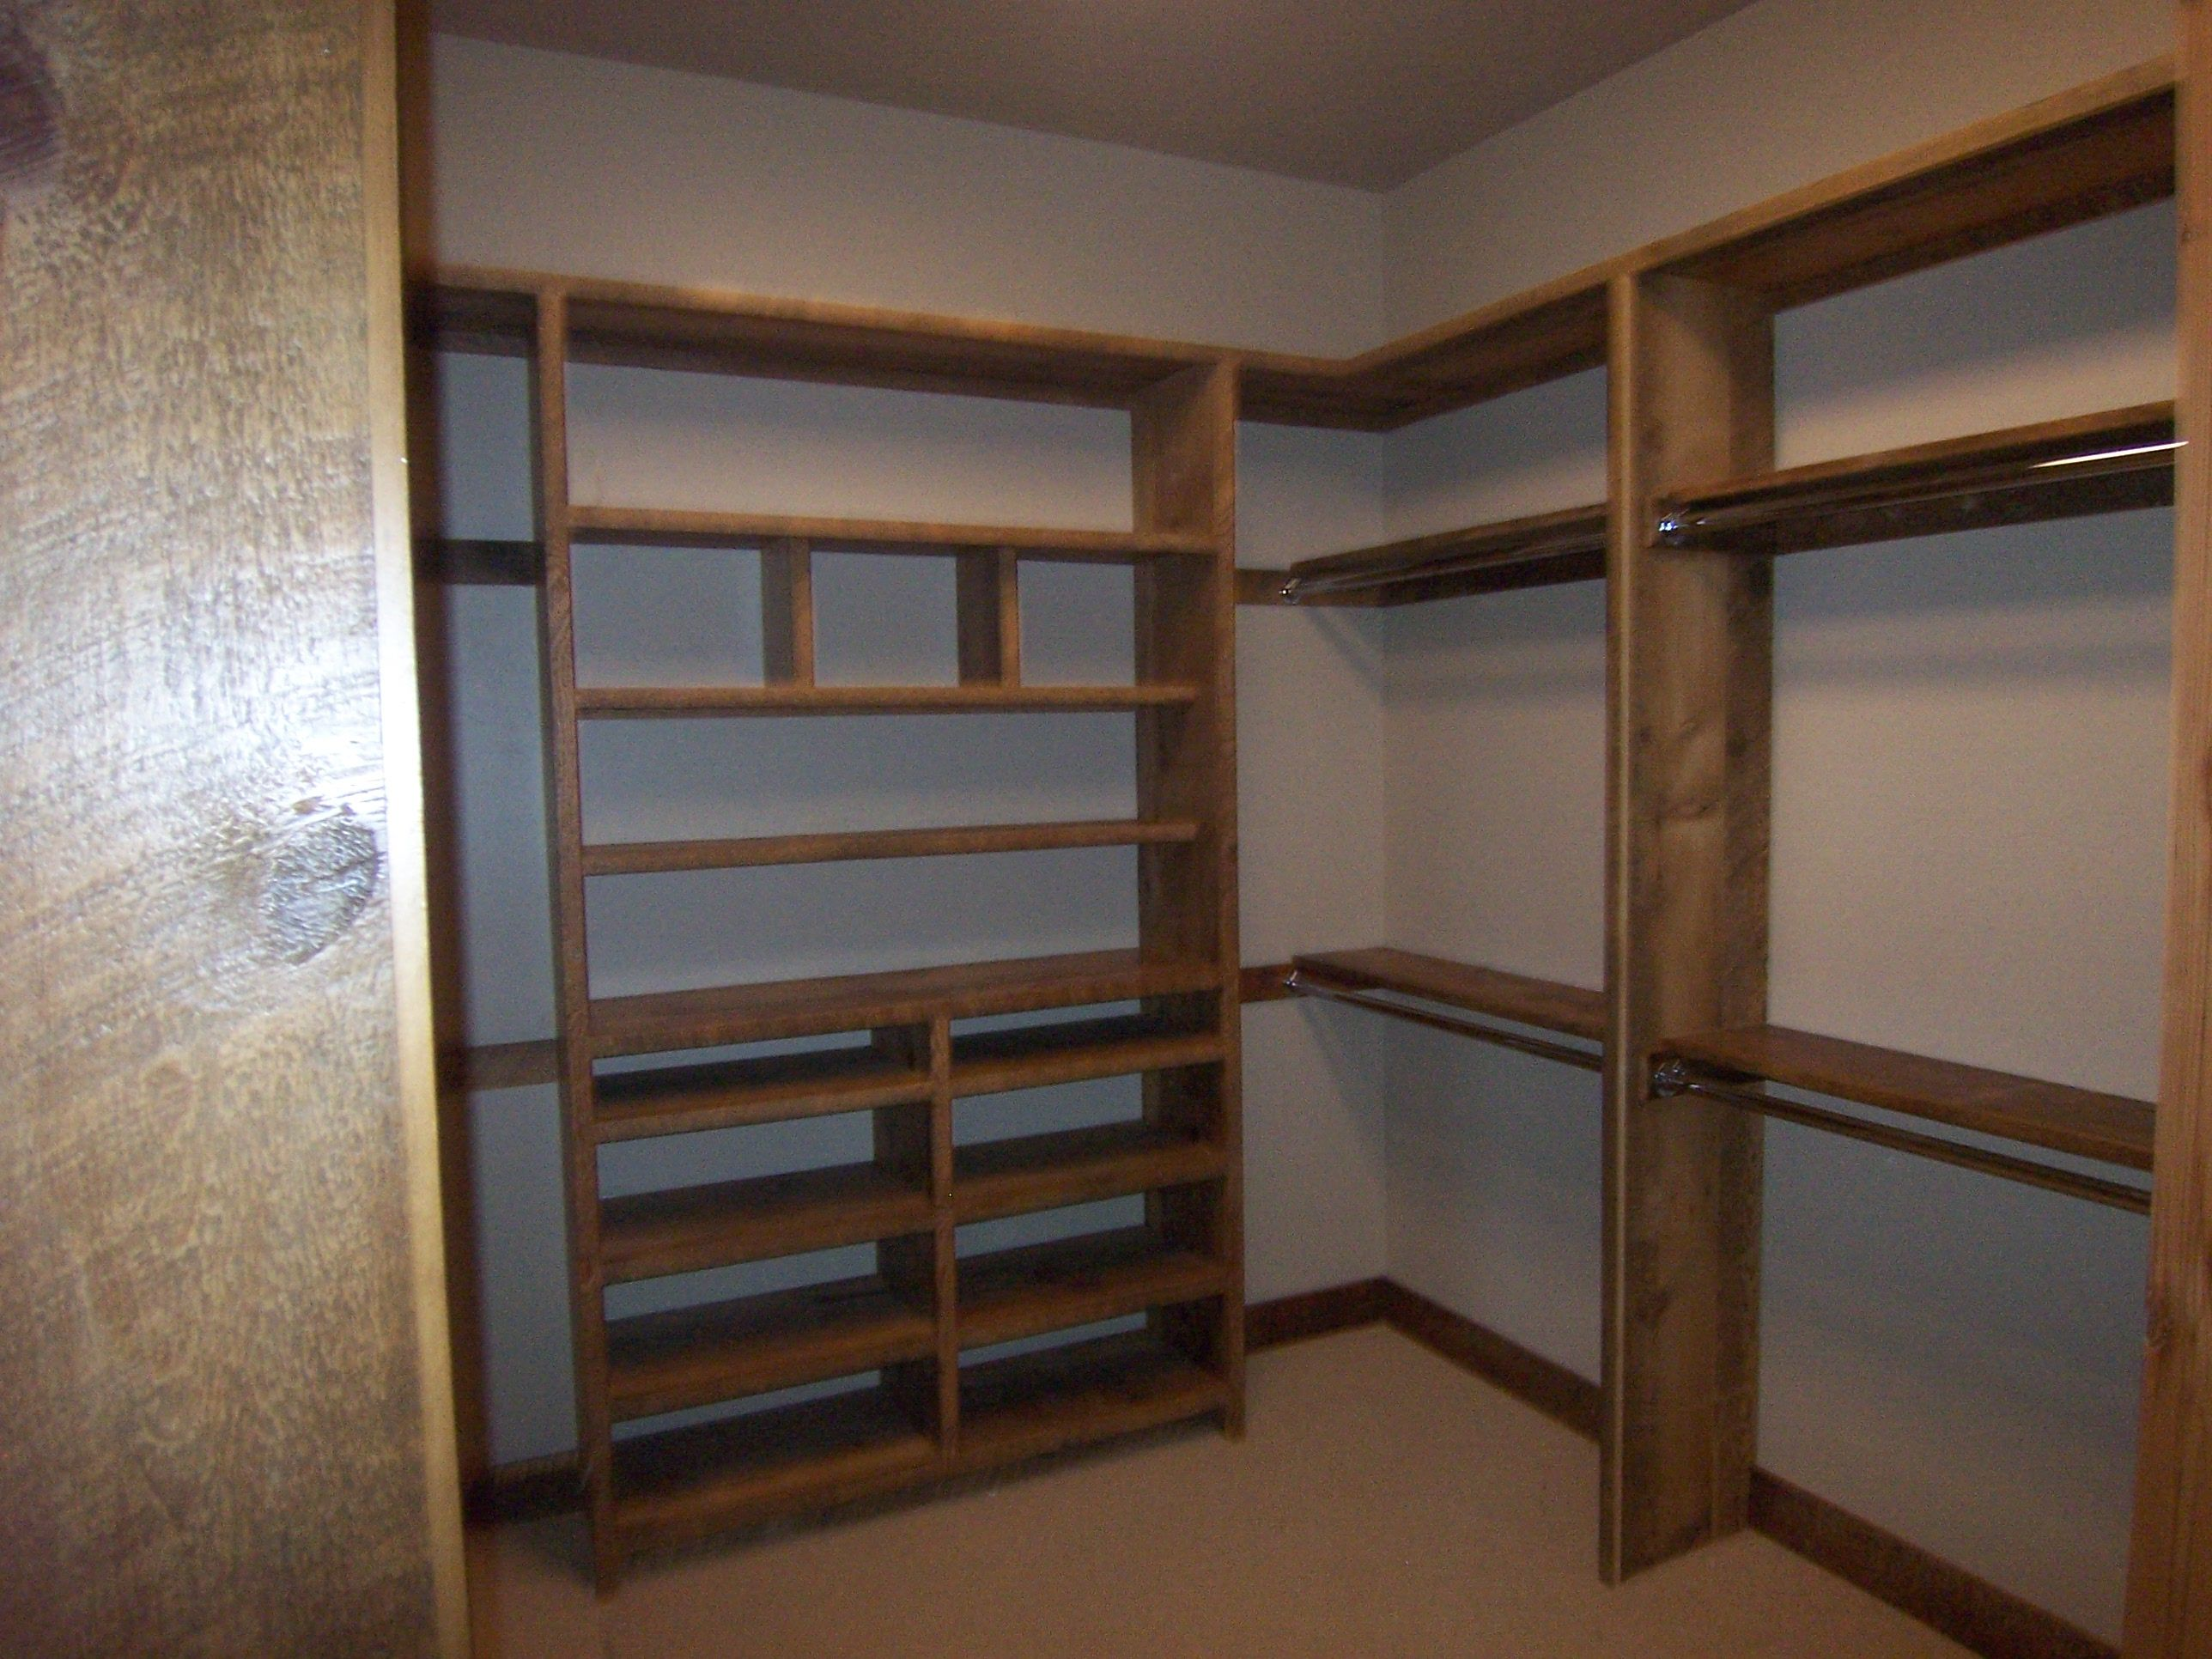 Custom Closet Shelving Recycled Barn Wood Revelations